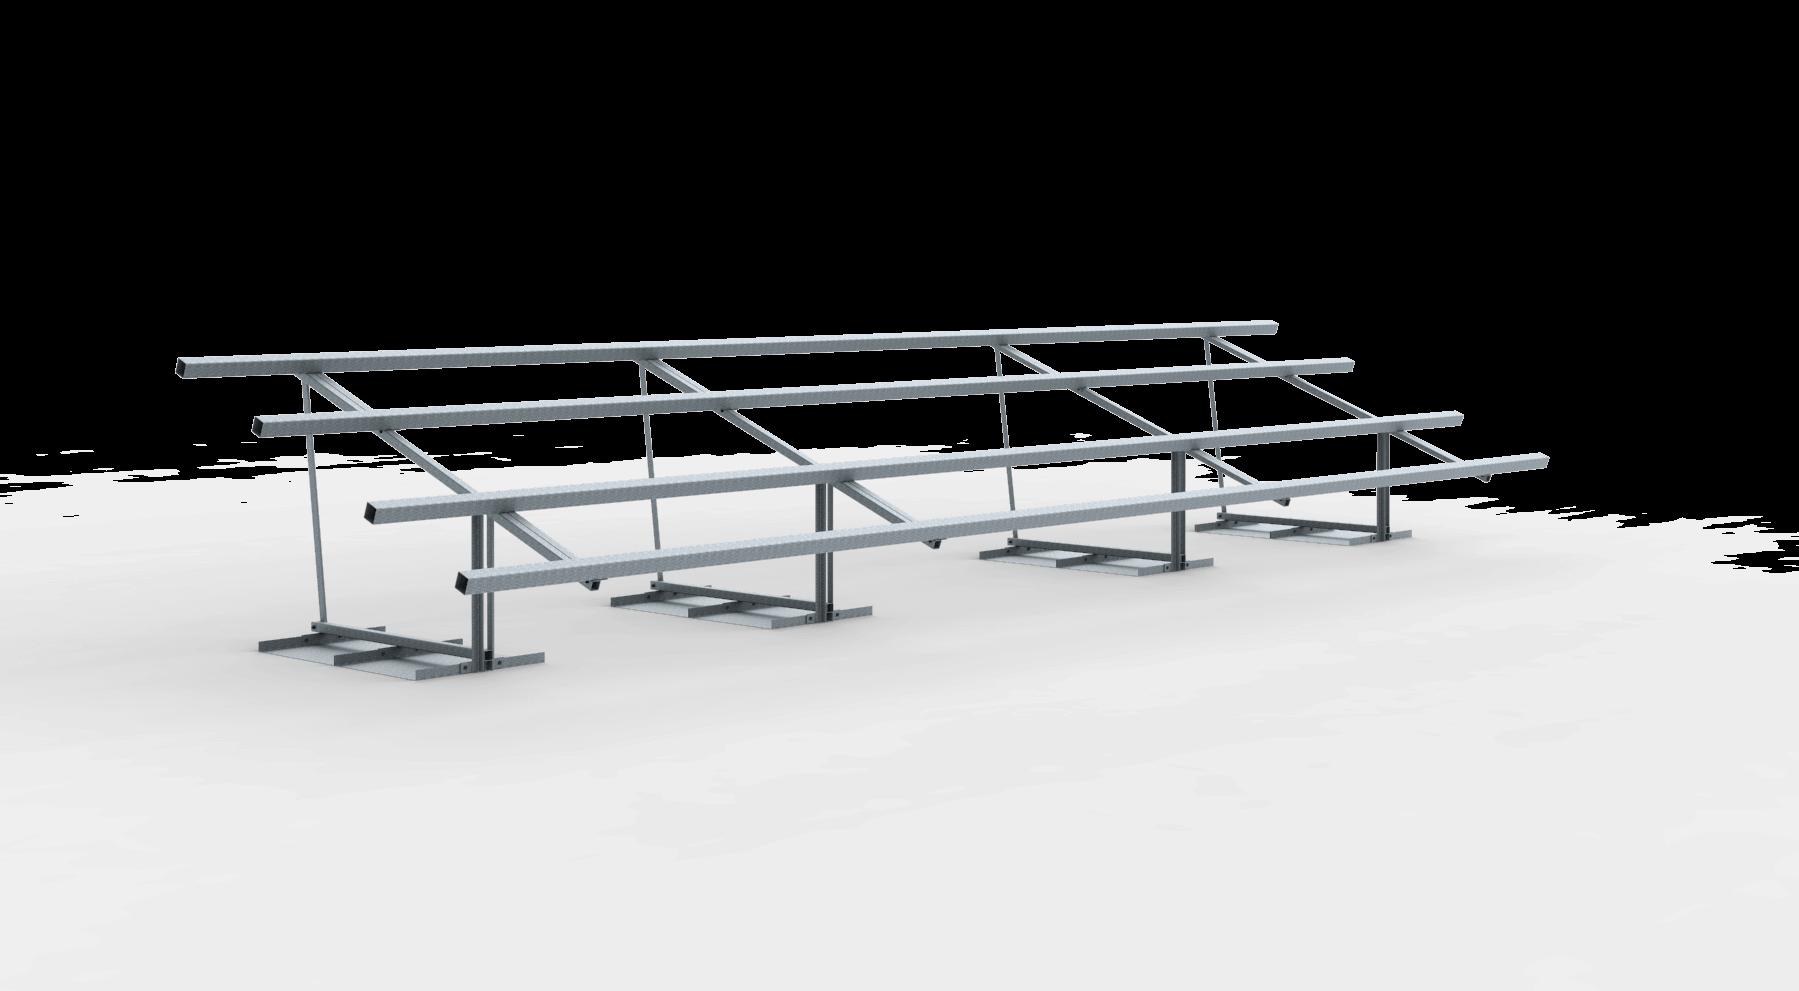 Frame vrije veldopstelling 18 zonnepanelen